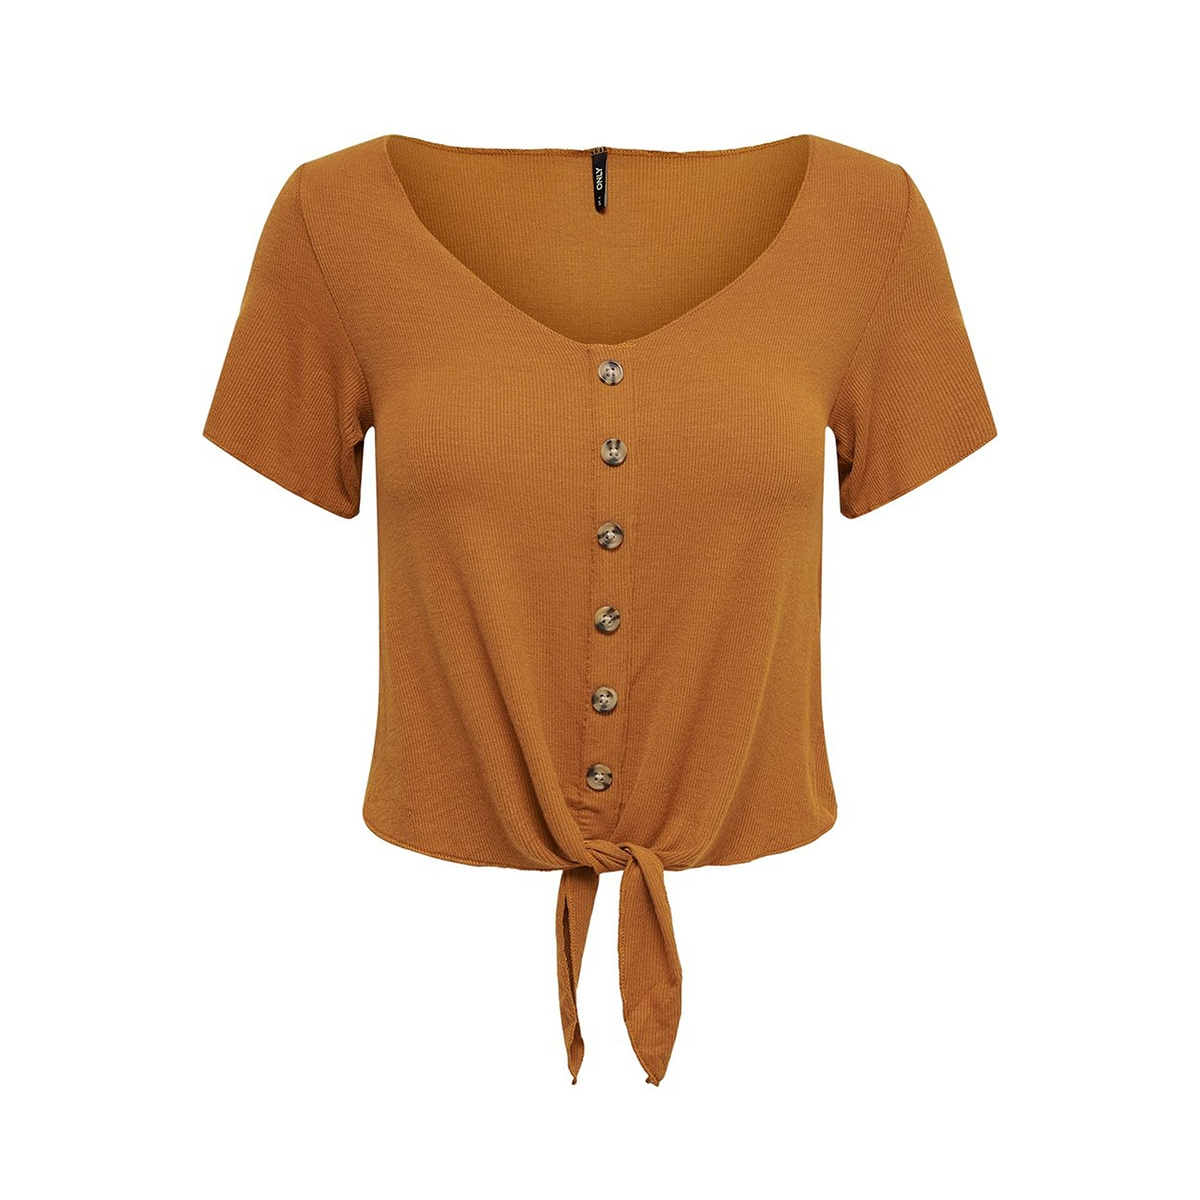 onlminka s/s knot top jrs 15179392 only t-shirt sugar almond